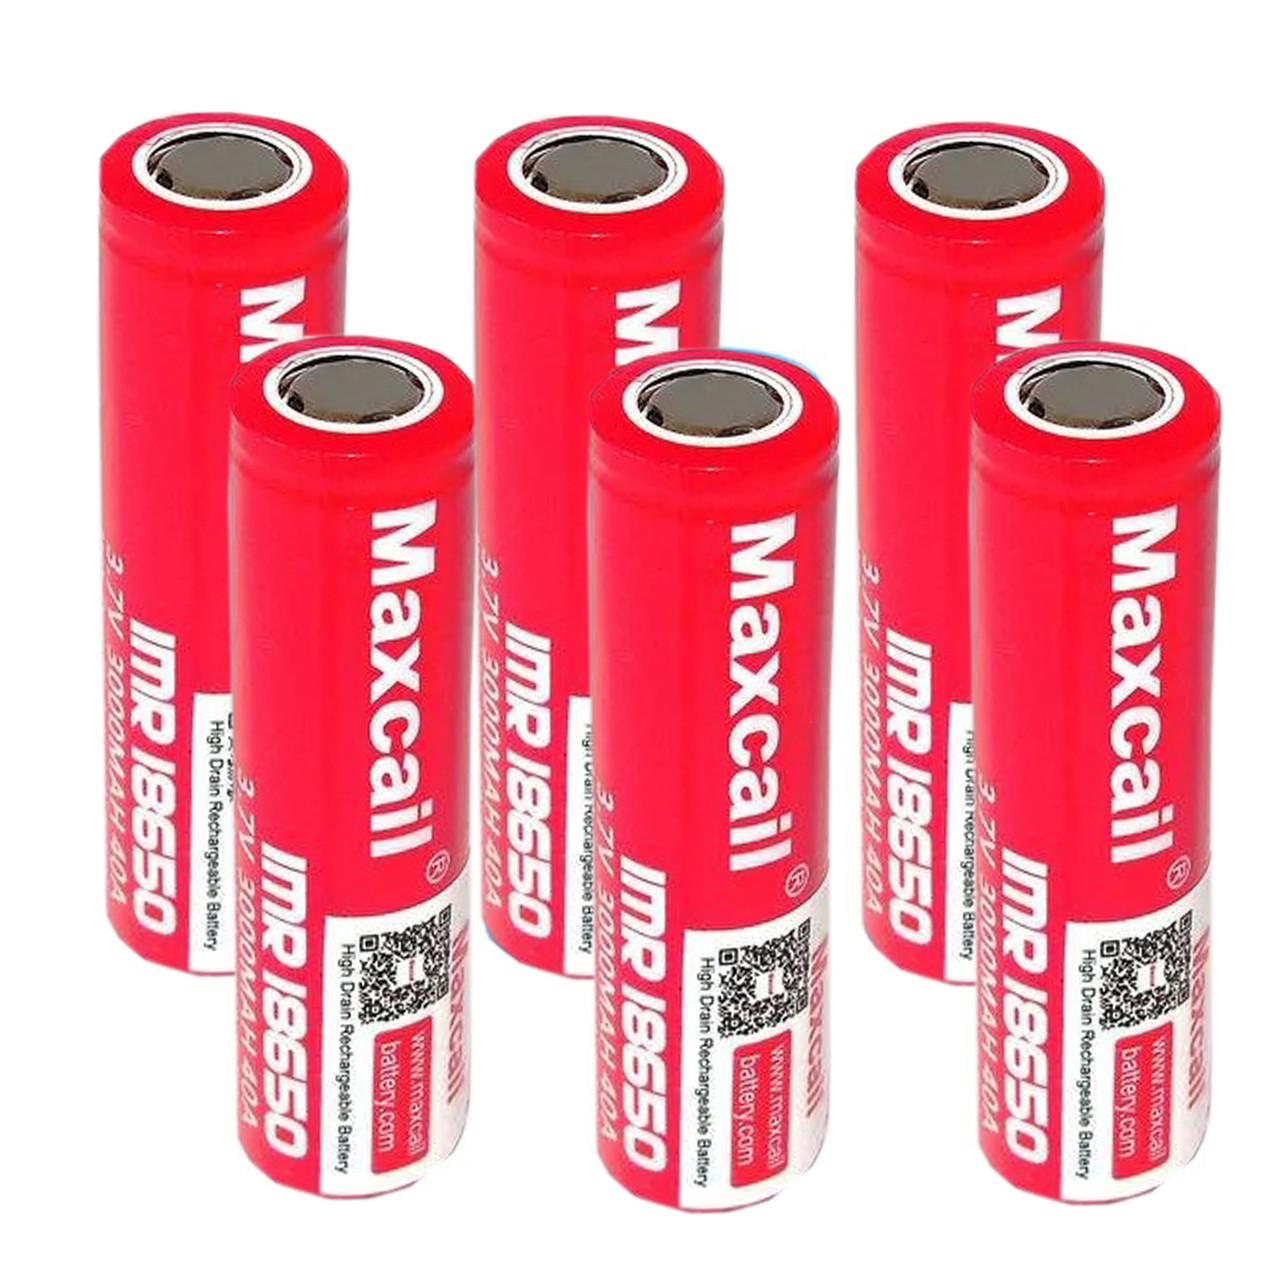 Комплект аккумуляторных батарей Литий 6 шт Ионная 18650 Pointed Efest BATTERY